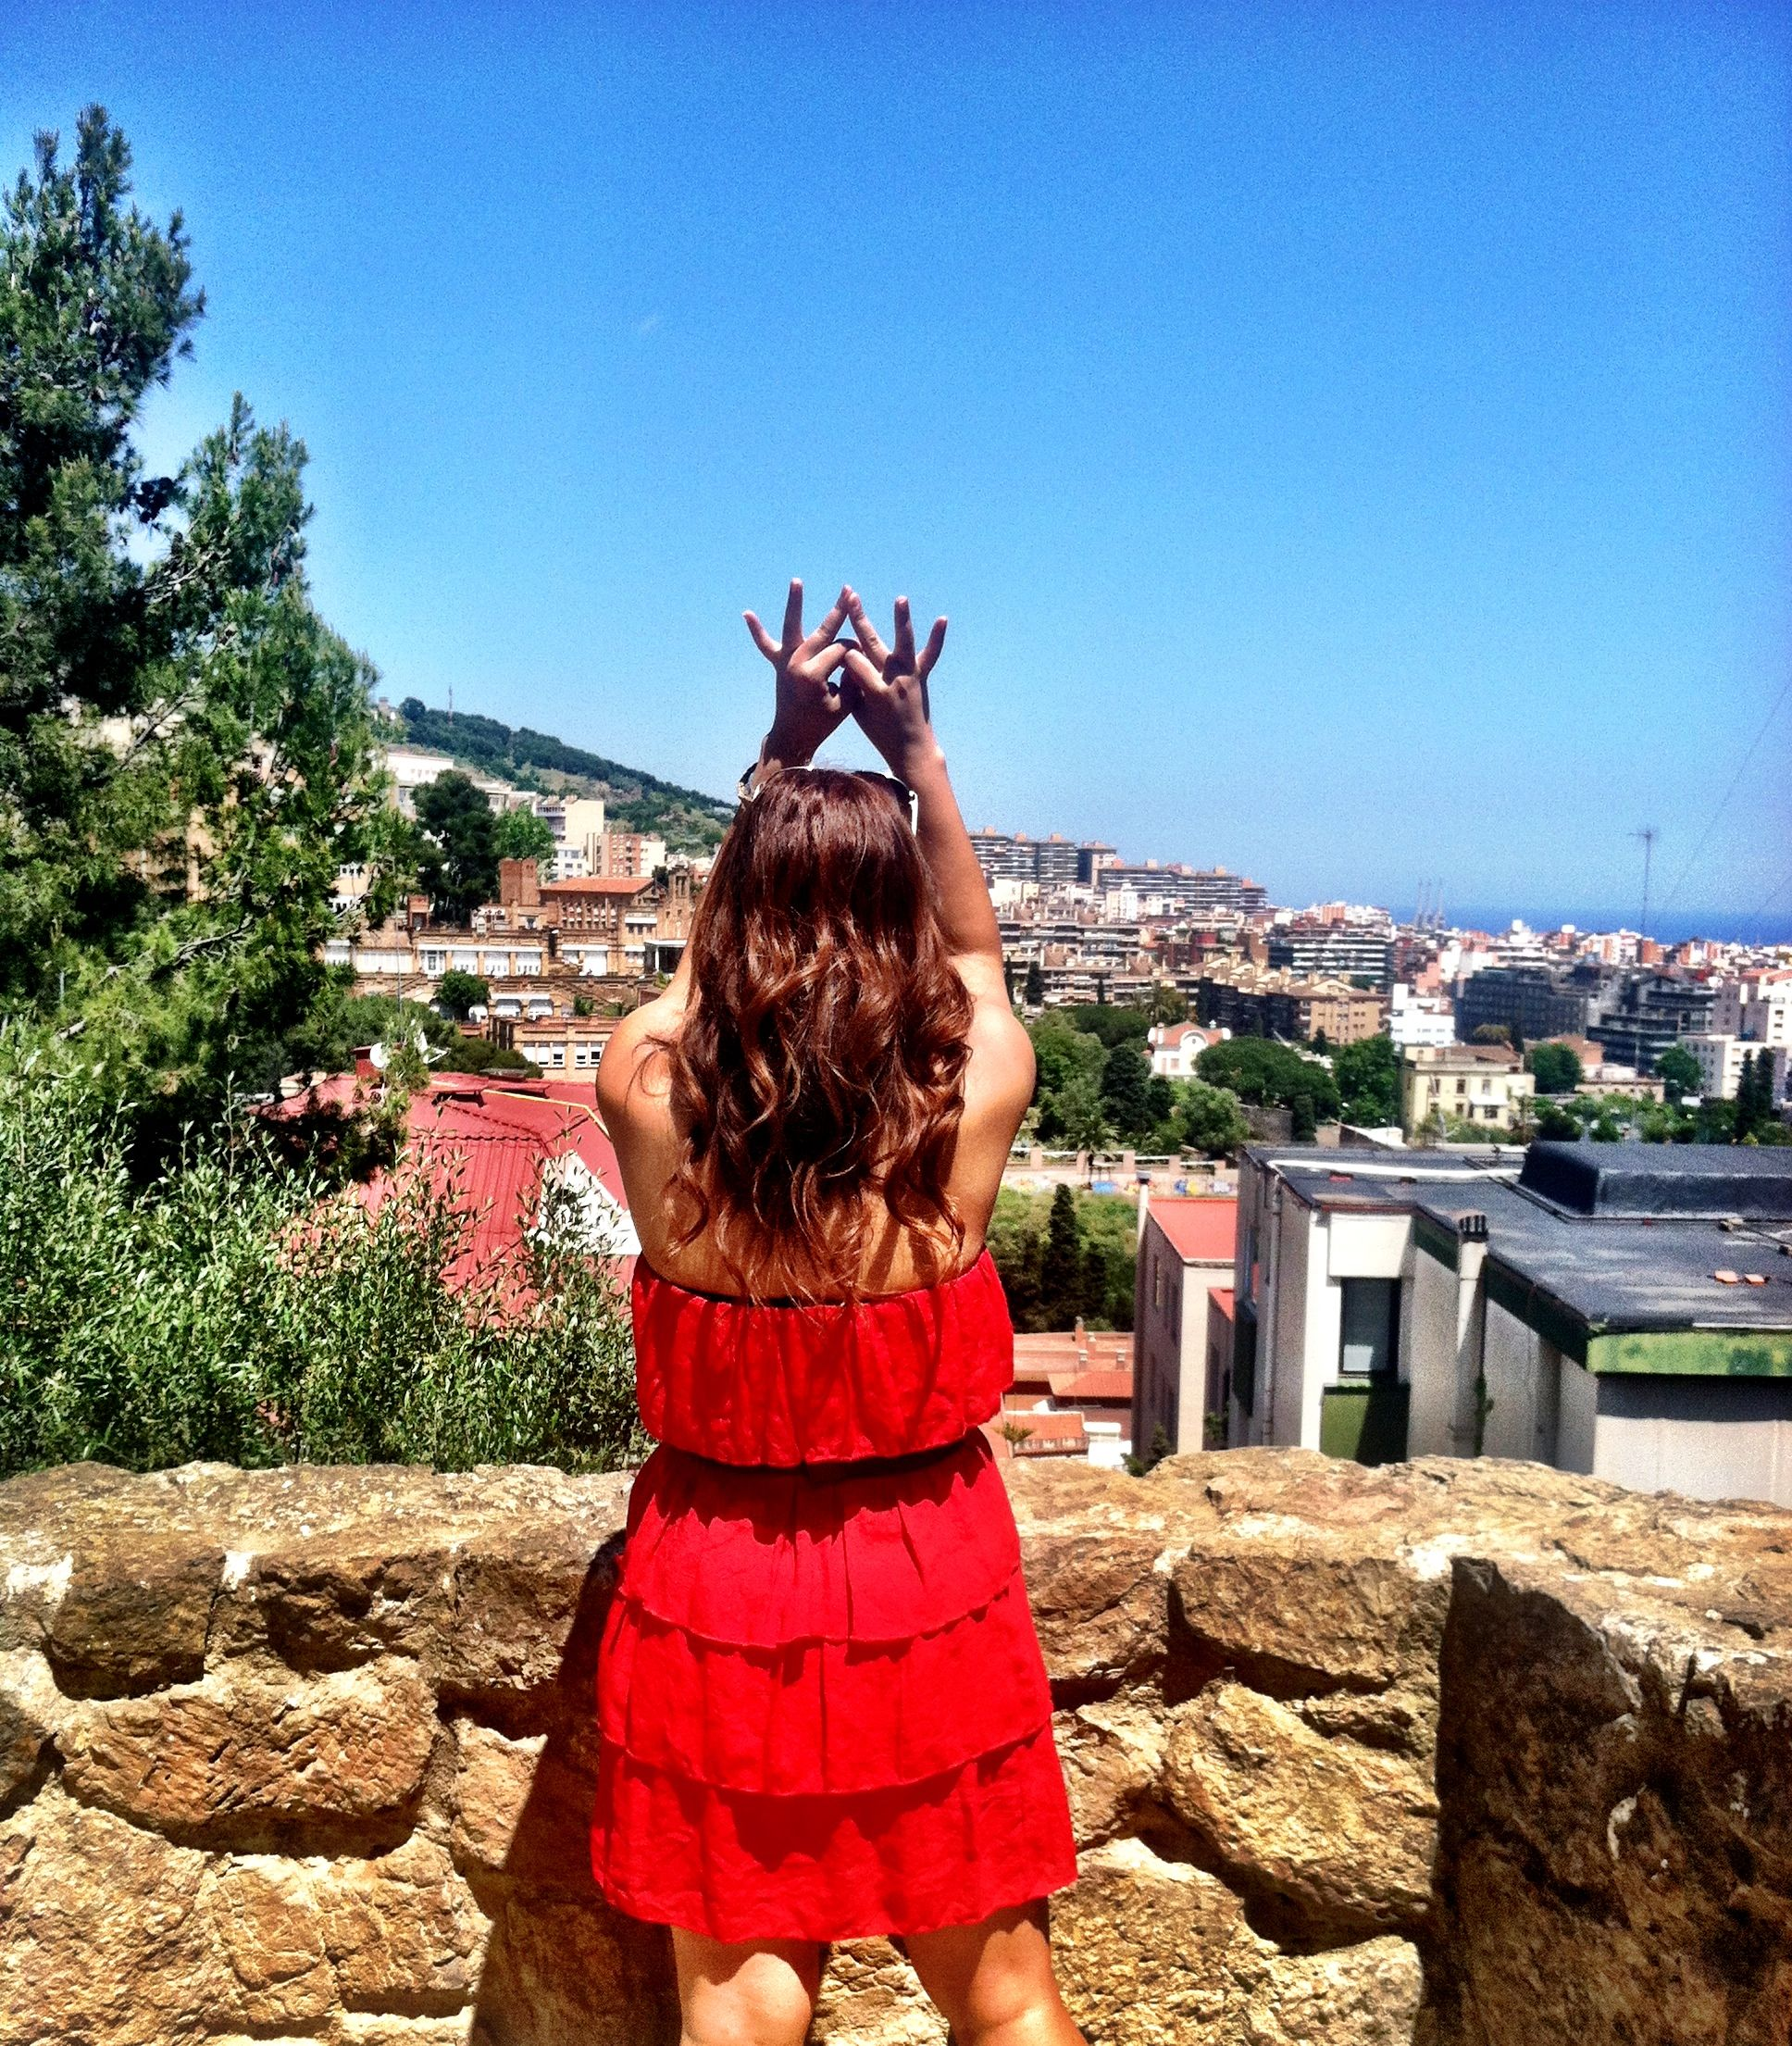 Throw what you know! #Barcelona #Spain #ZTA #Zeta #ZetaTauAlpha #Greek #Europe